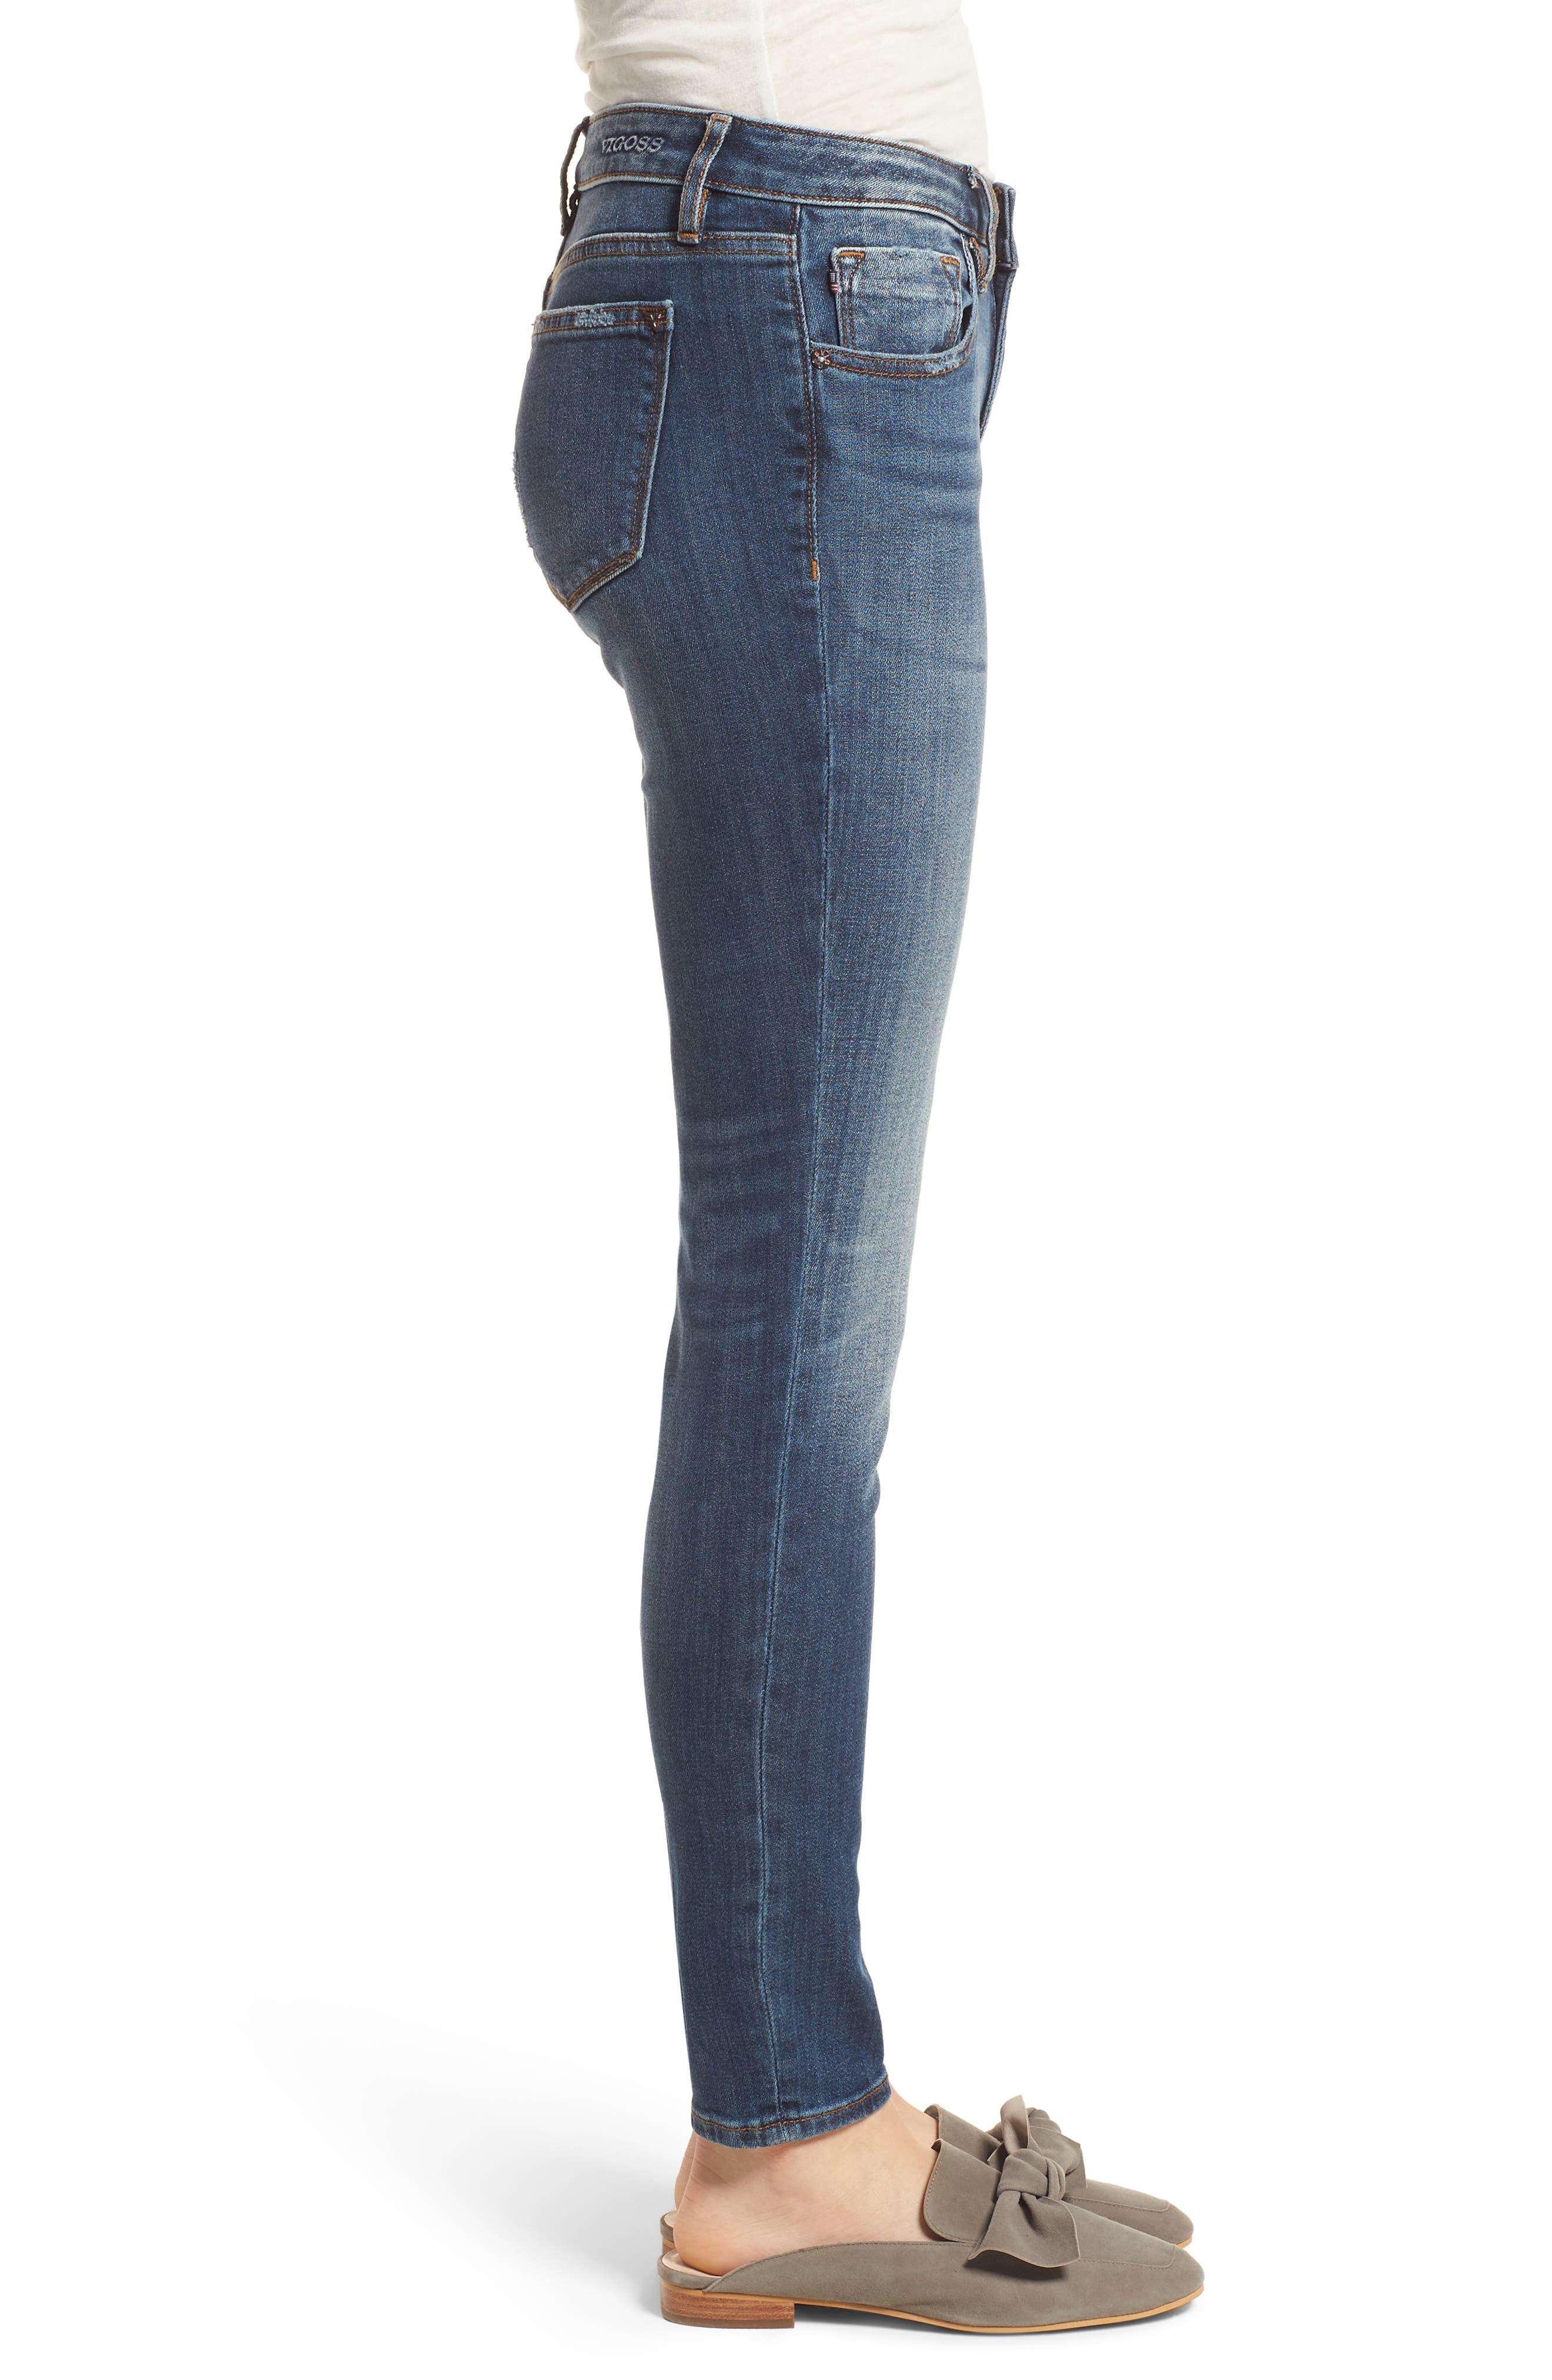 Jagger Skinny Jeans,                             Alternate thumbnail 3, color,                             Medium Wash